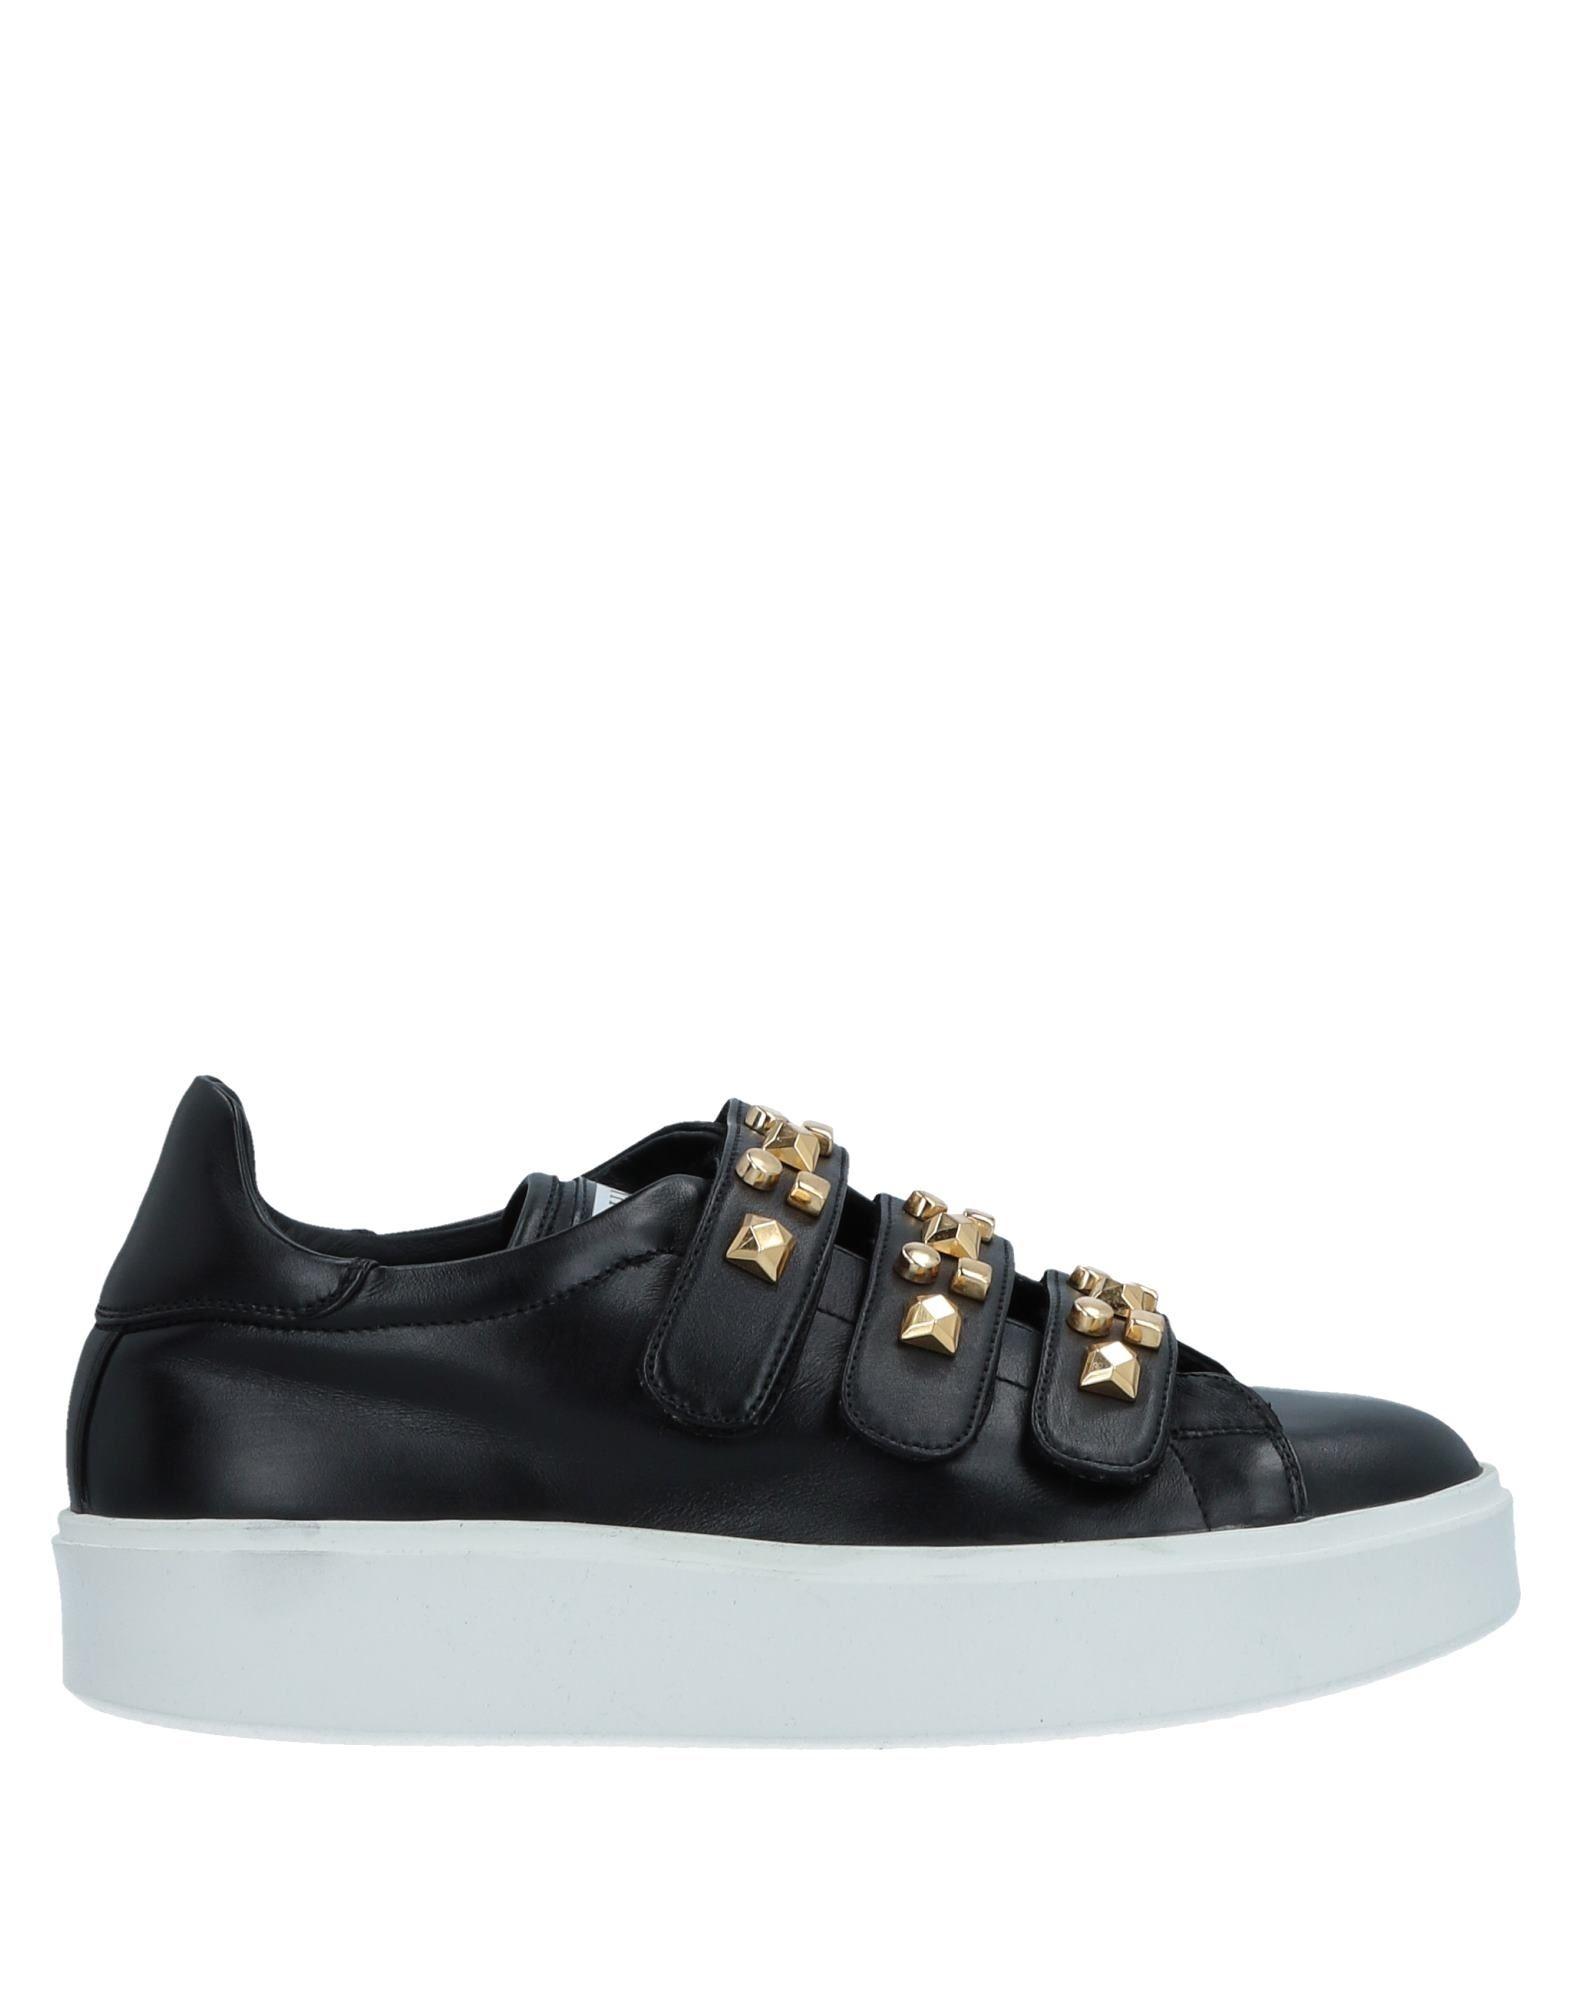 Rabatt Schuhe Le Silla Sneakers Damen  11523227OG